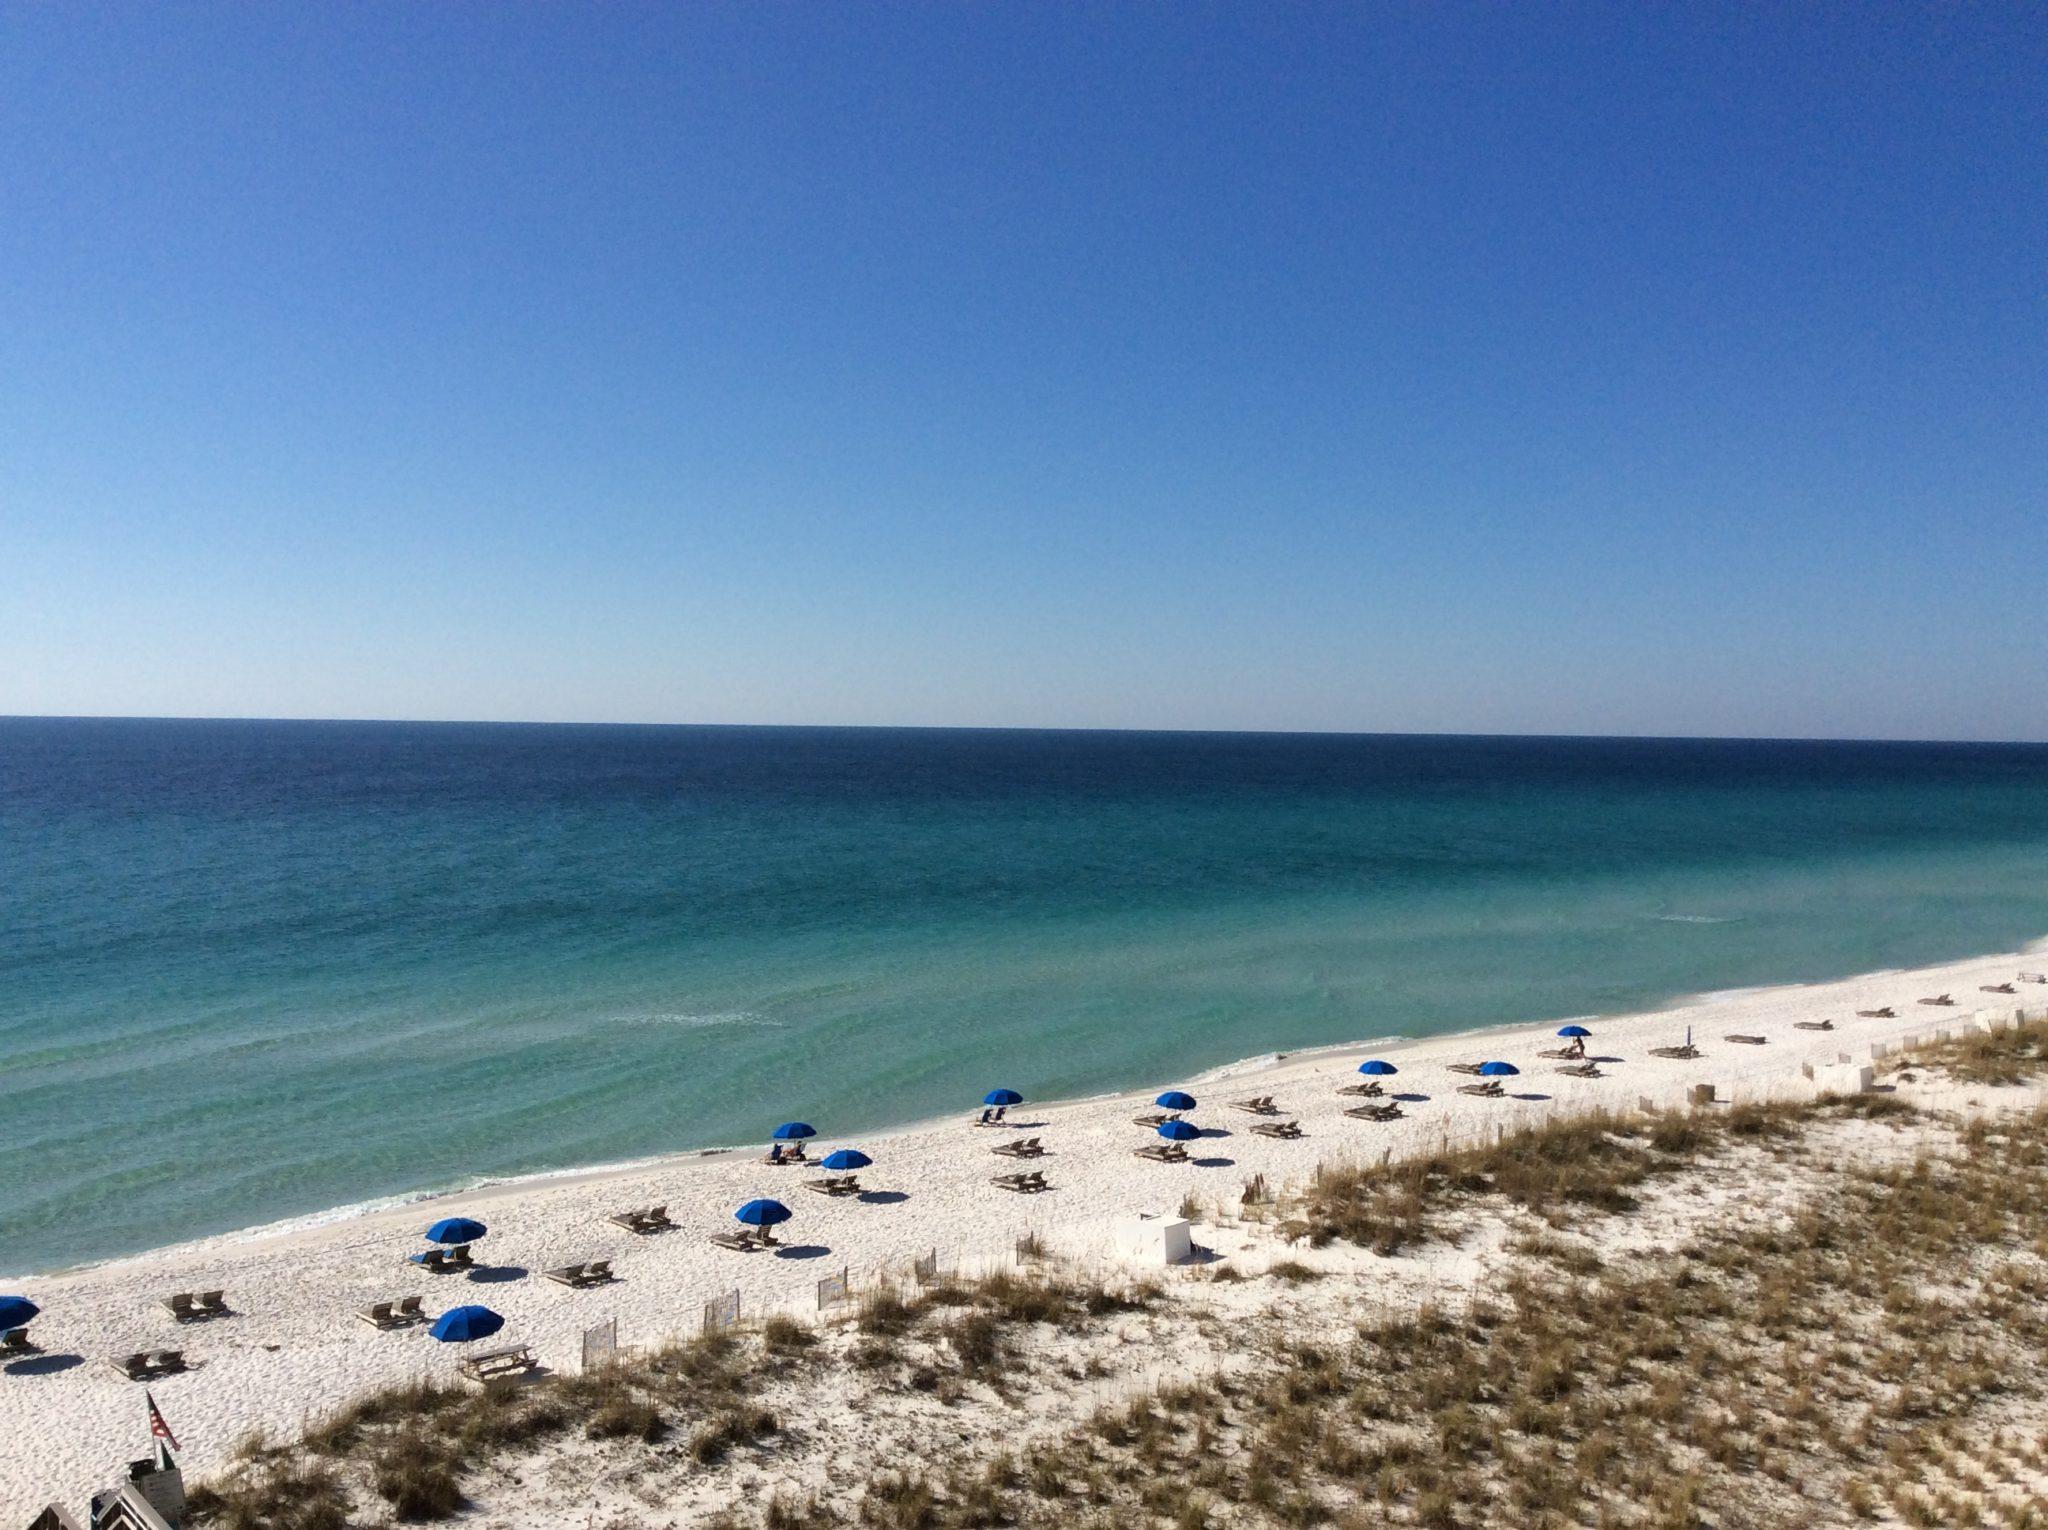 Beach behind Margaritaville Hotel, Pensacola Beach, FL by Judy K. Walker